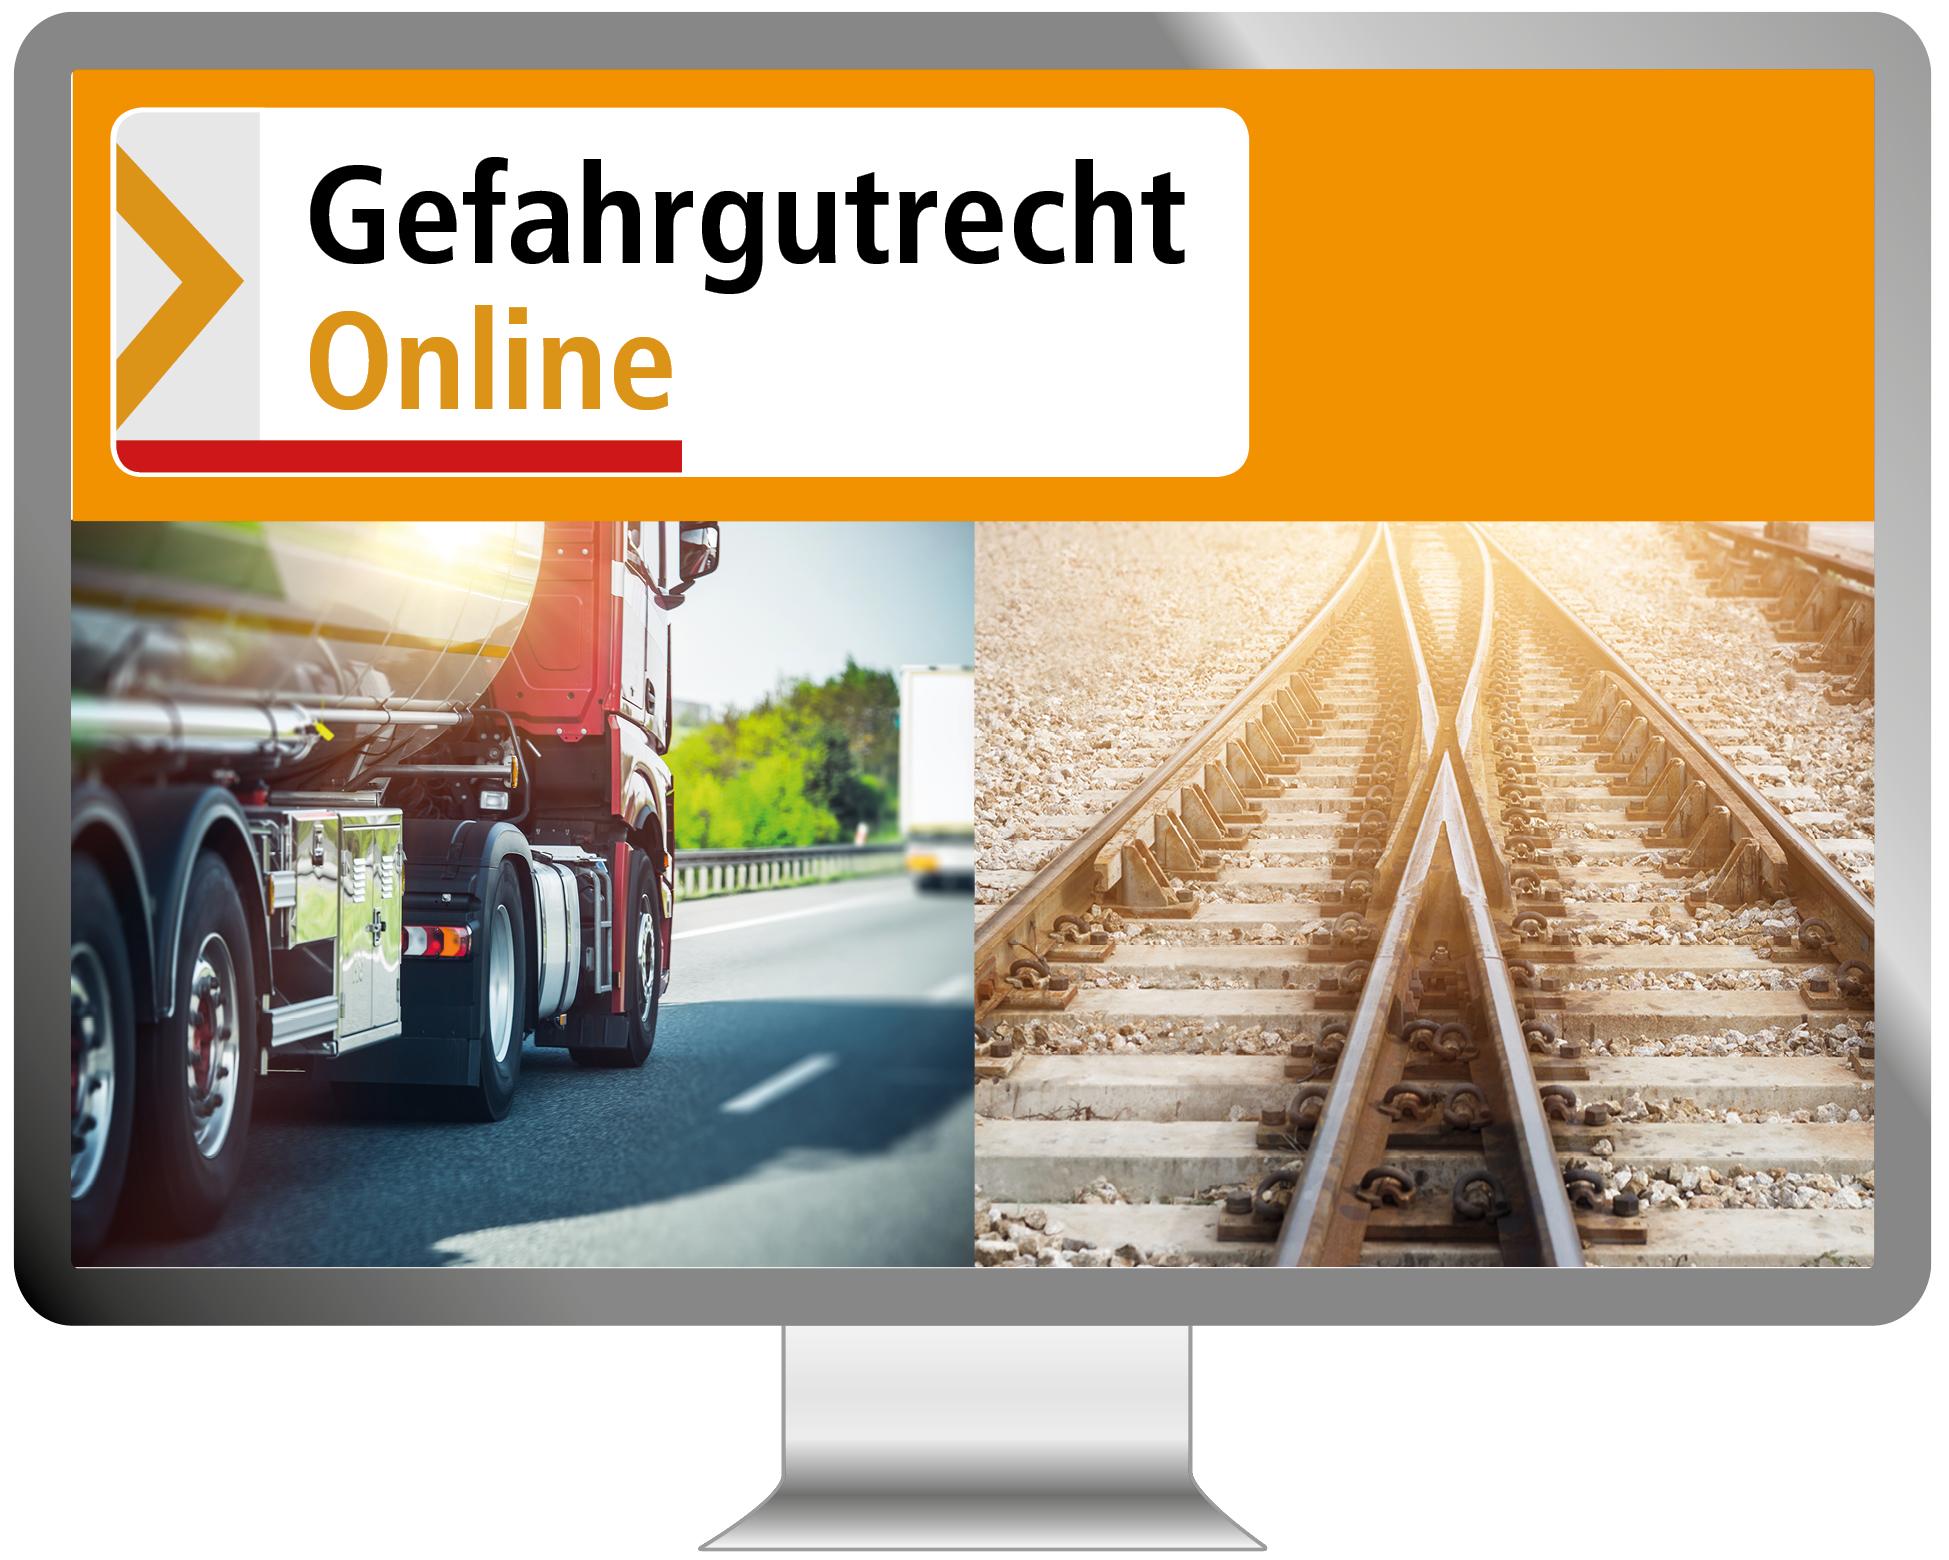 Gefahrgutrecht Online